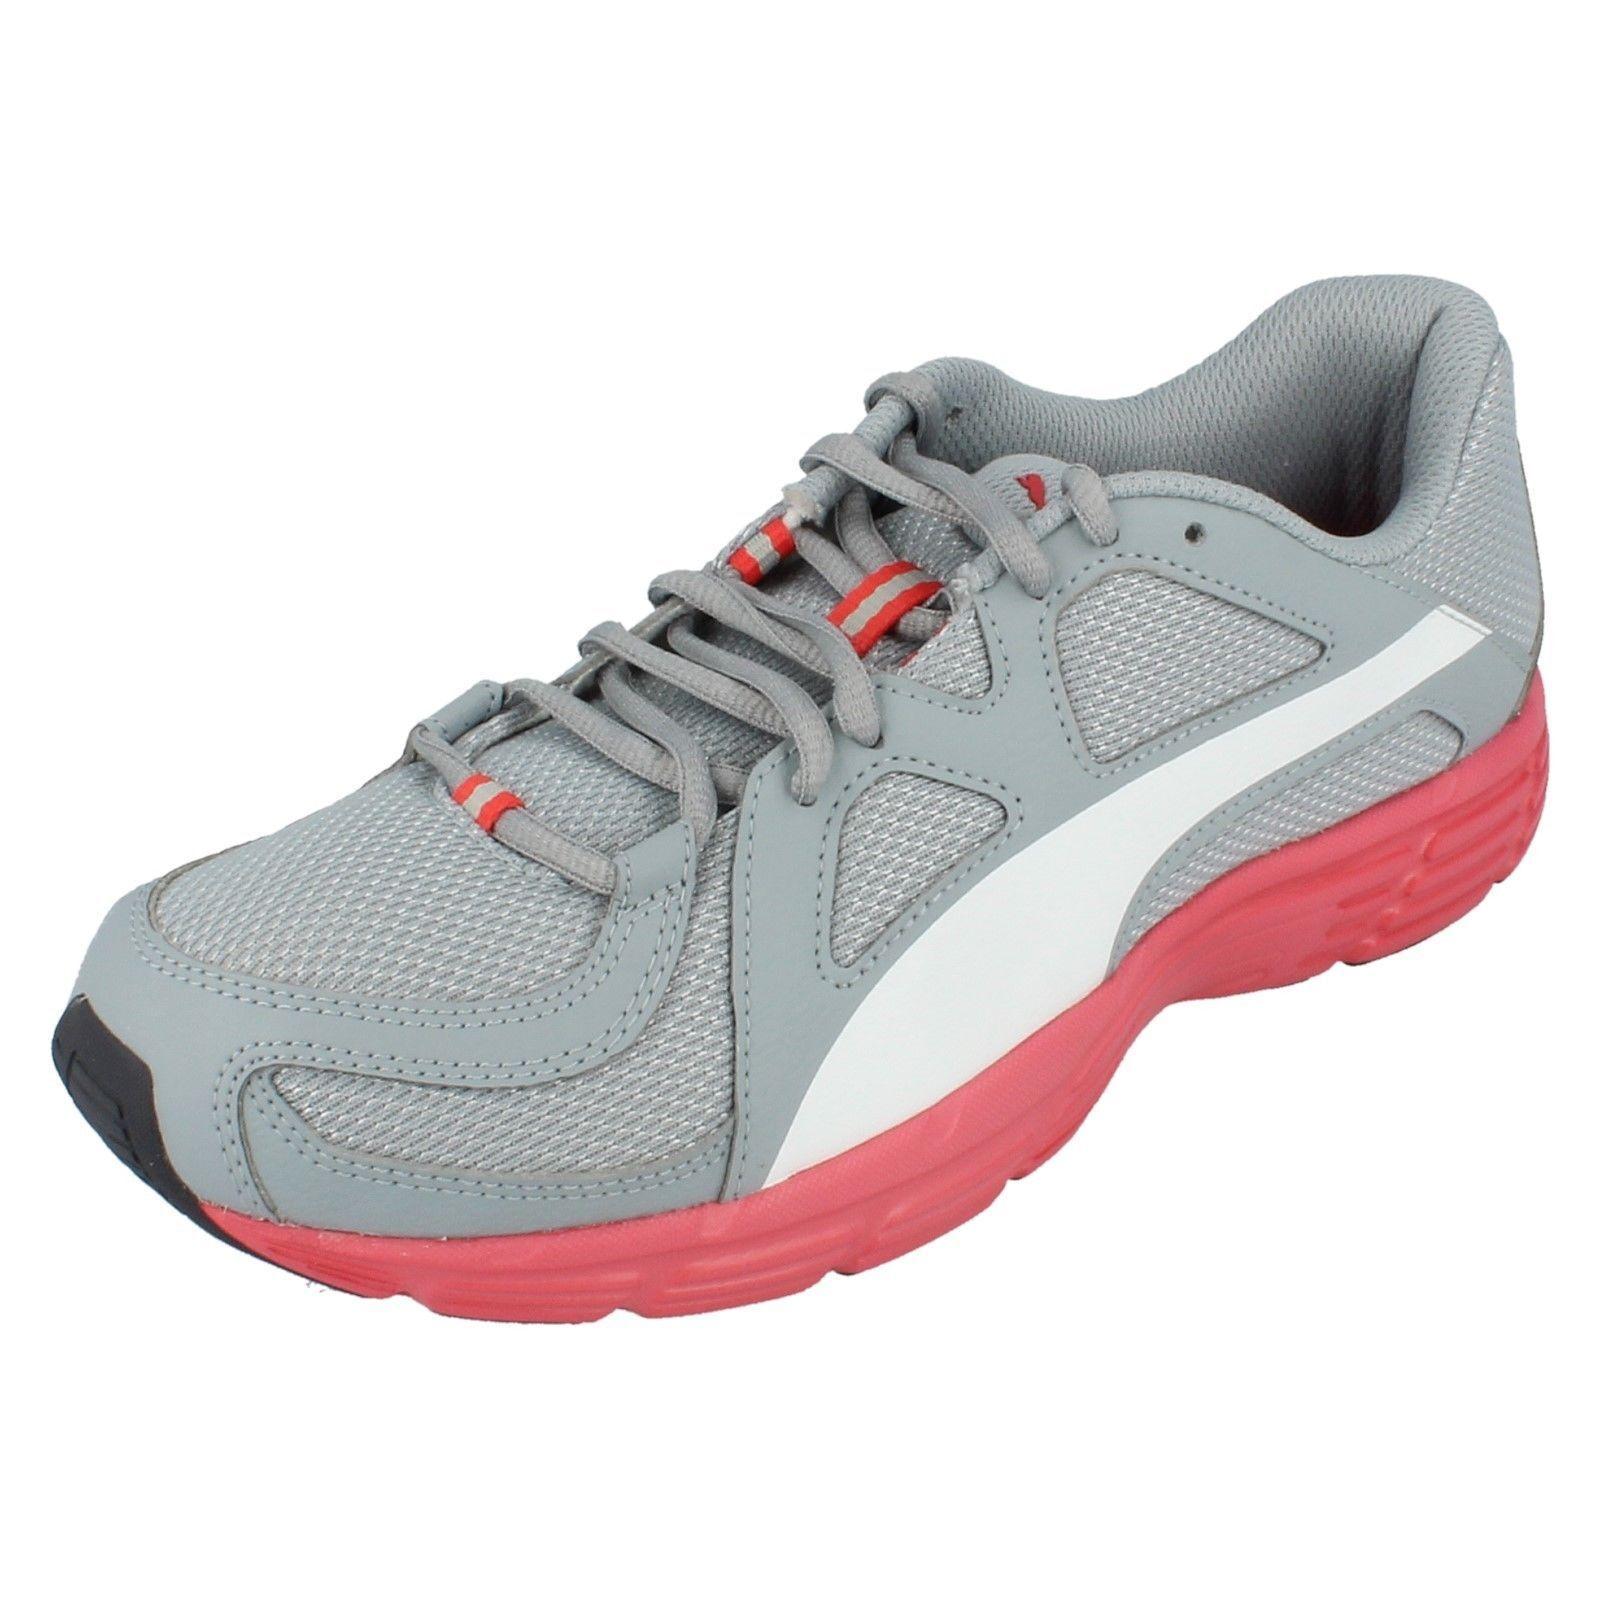 Hombre Puma Zapatillas - Axis V3 Malla Wild casual shoes